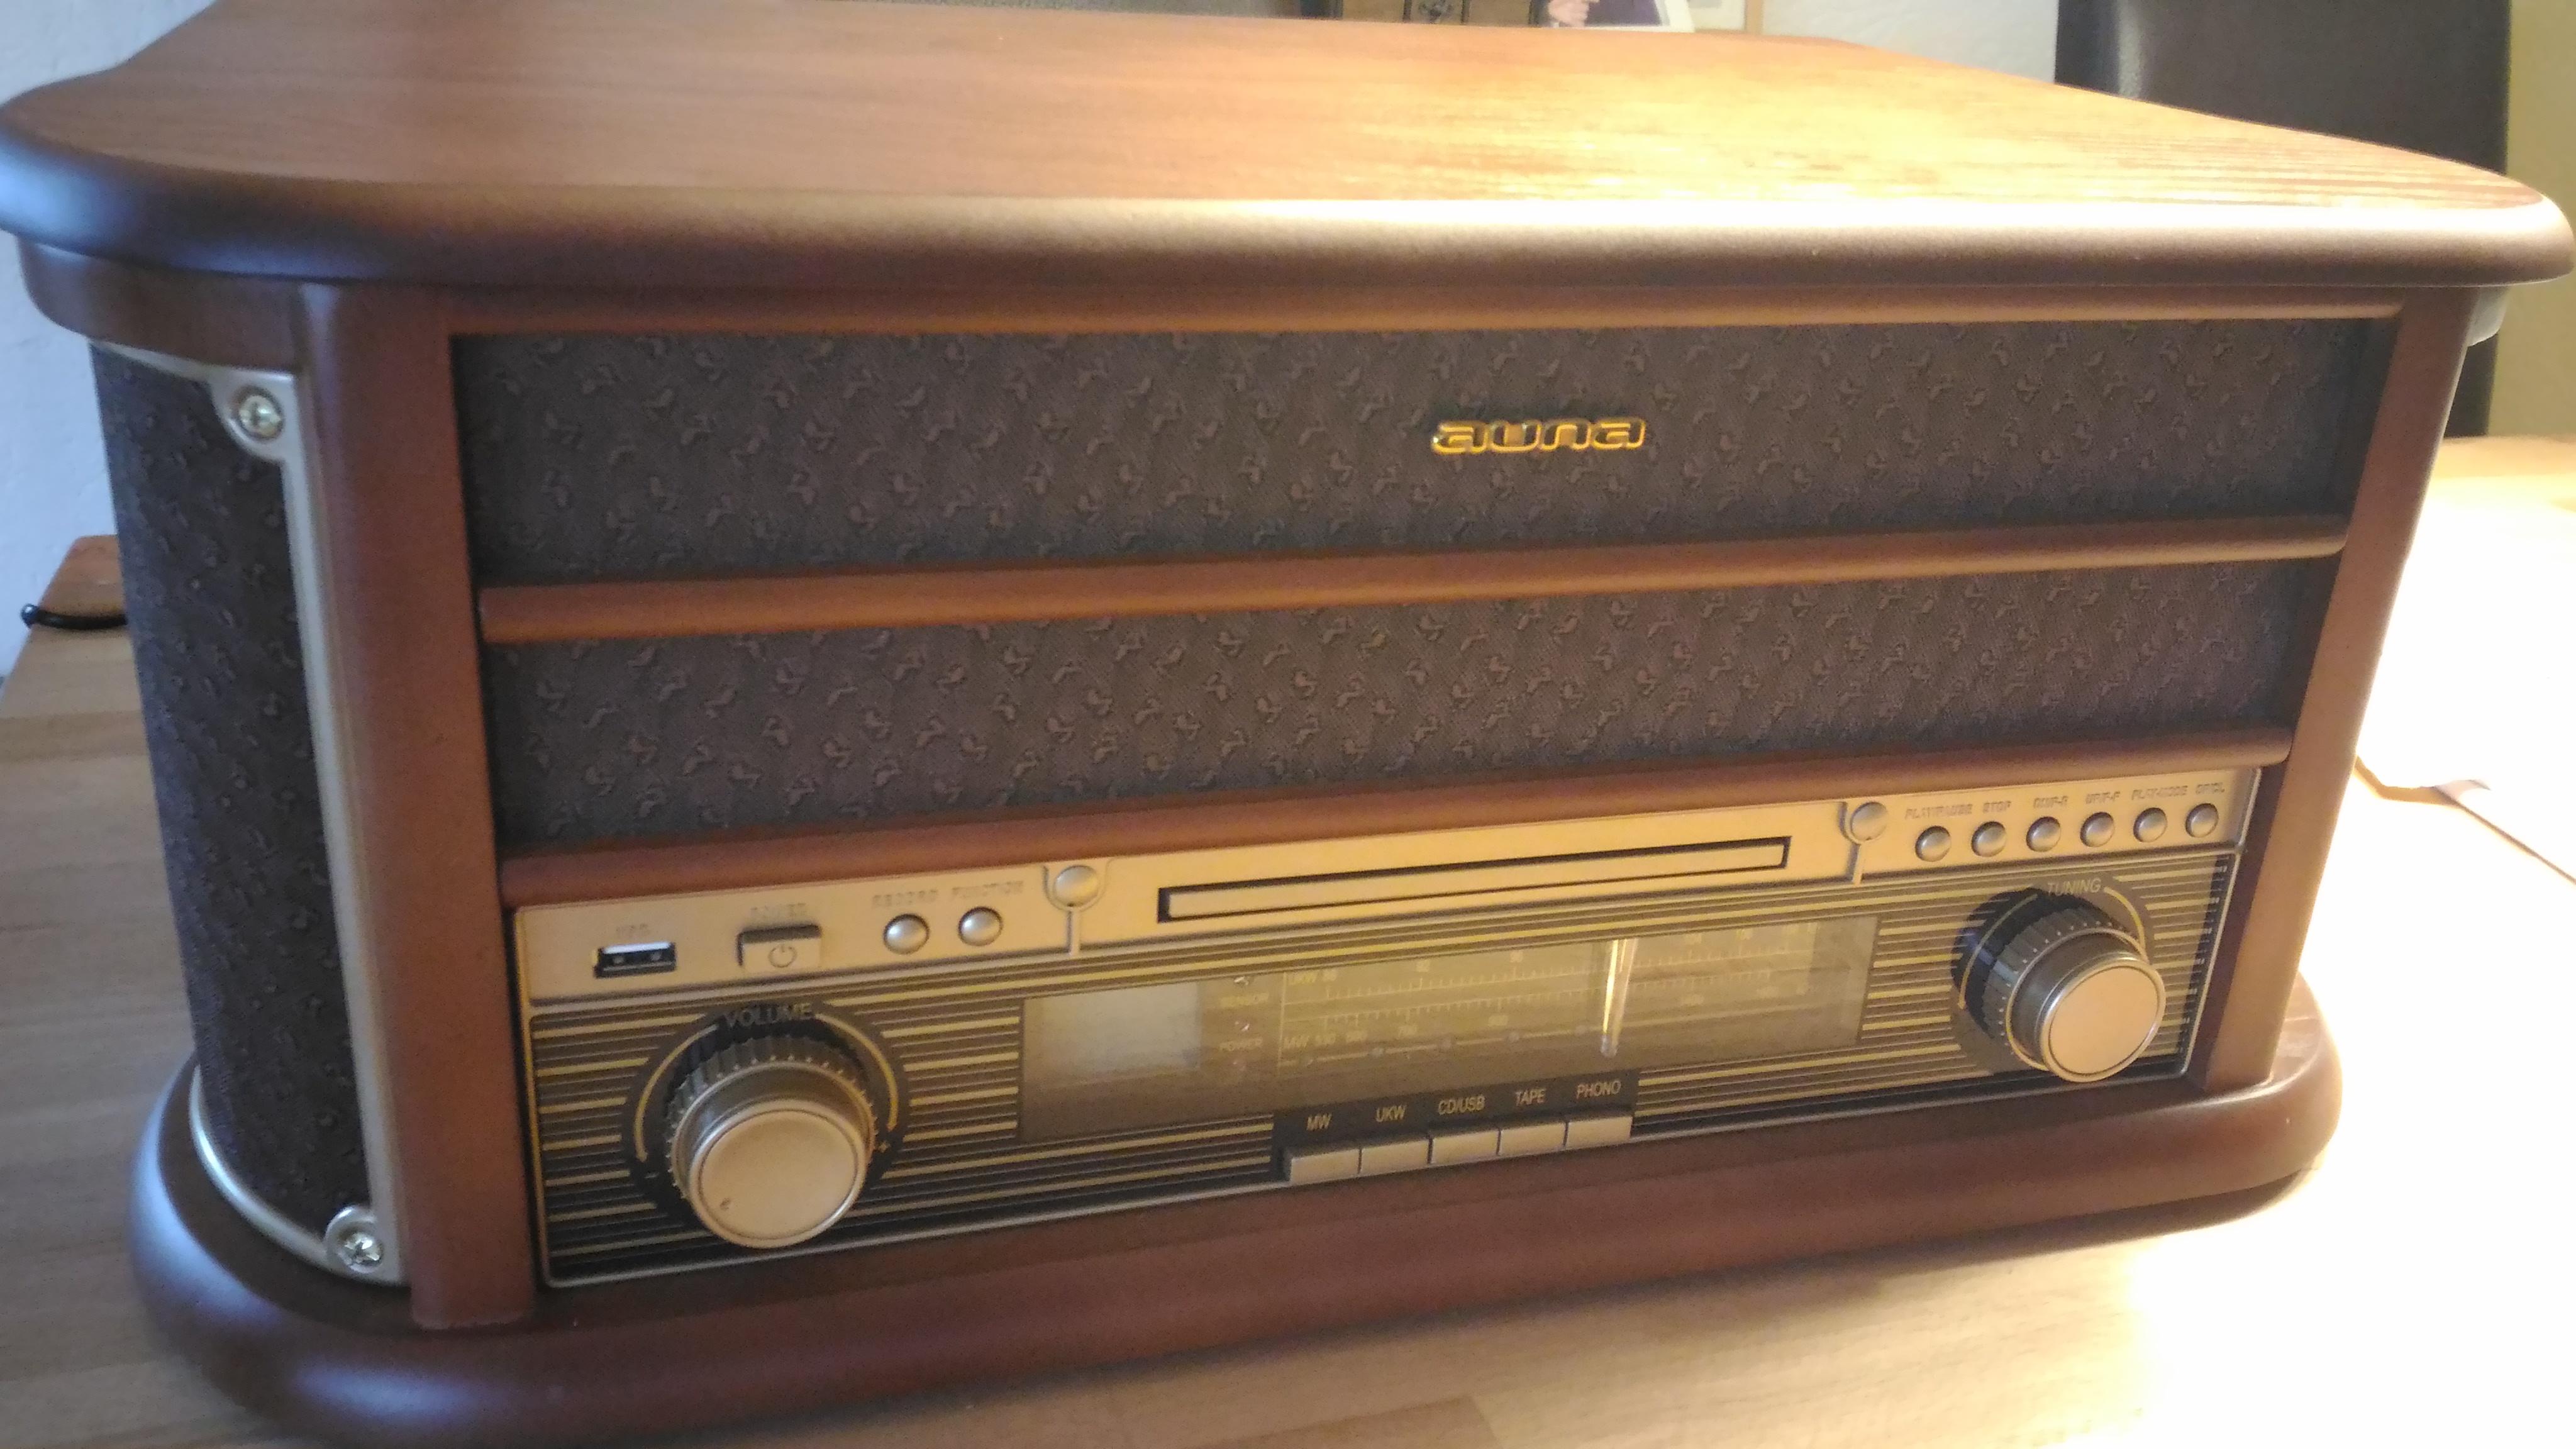 auna belle epoque 1908 plattenspieler retro stereoanlage musikanlage cd player usb slot. Black Bedroom Furniture Sets. Home Design Ideas